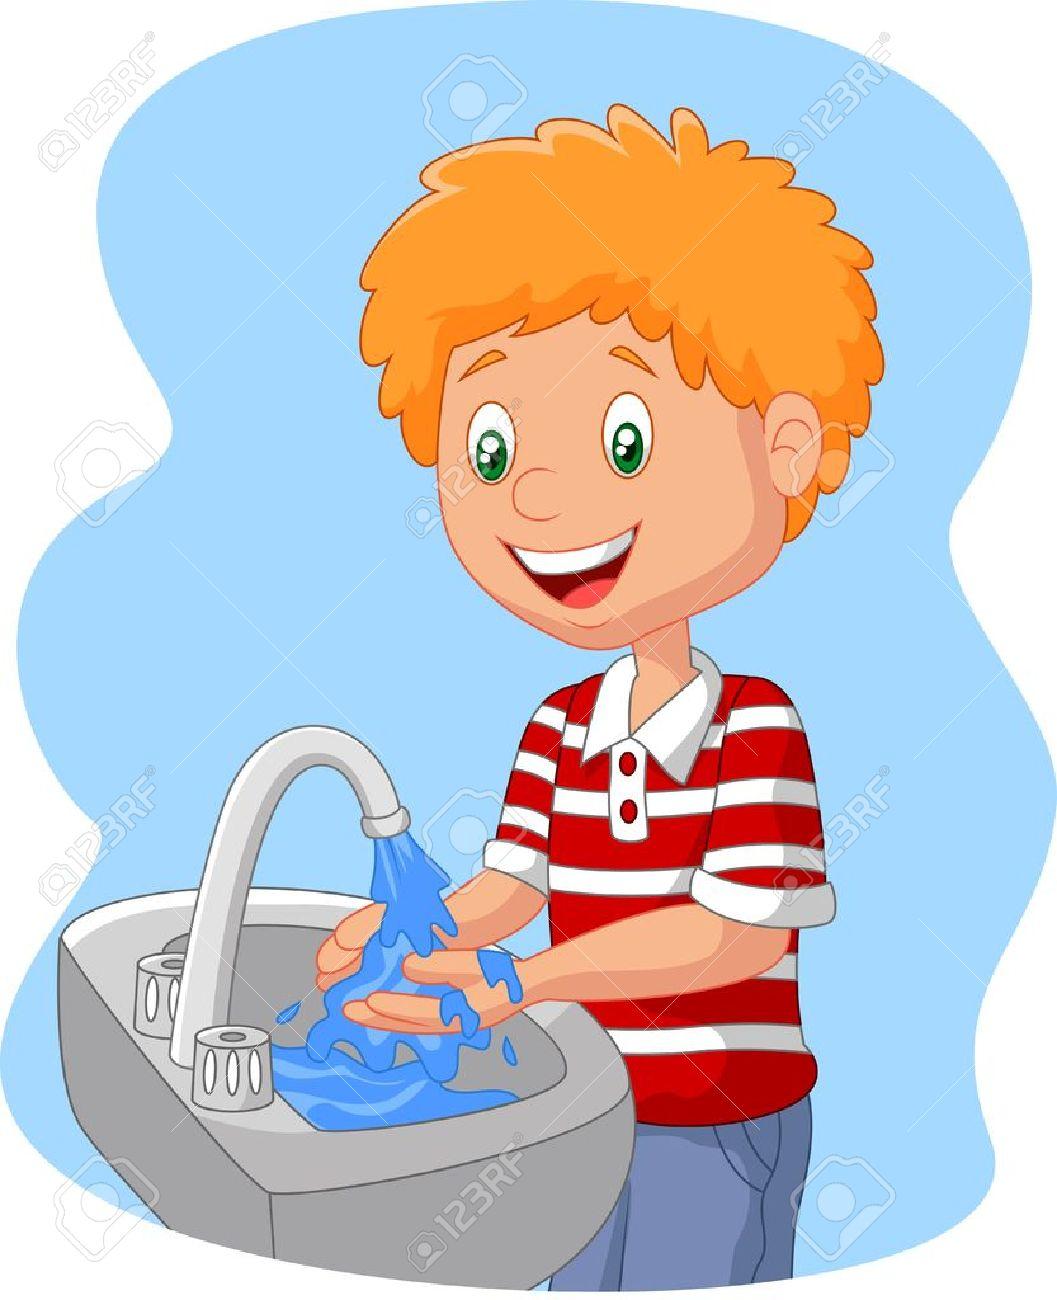 Cartoon boy washing hand.